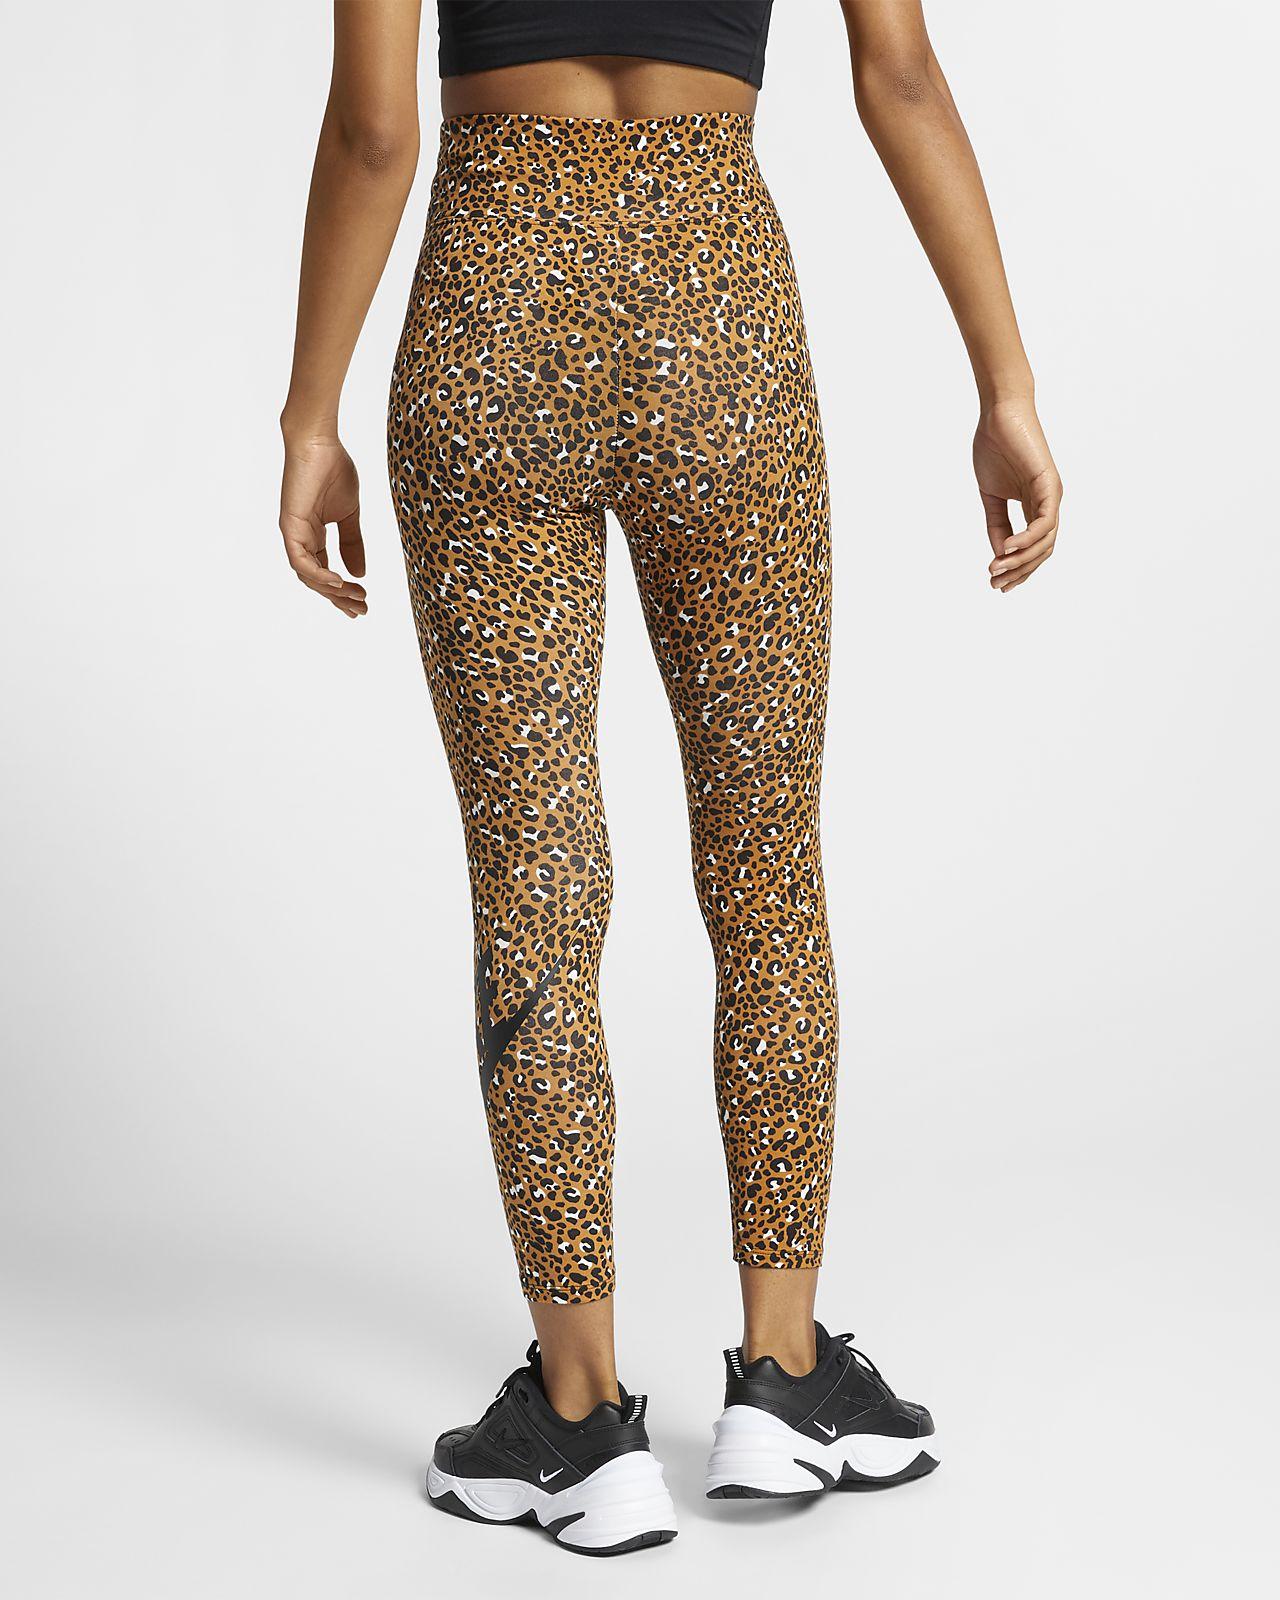 Nike Sportswear Animal Print Women's Leggings